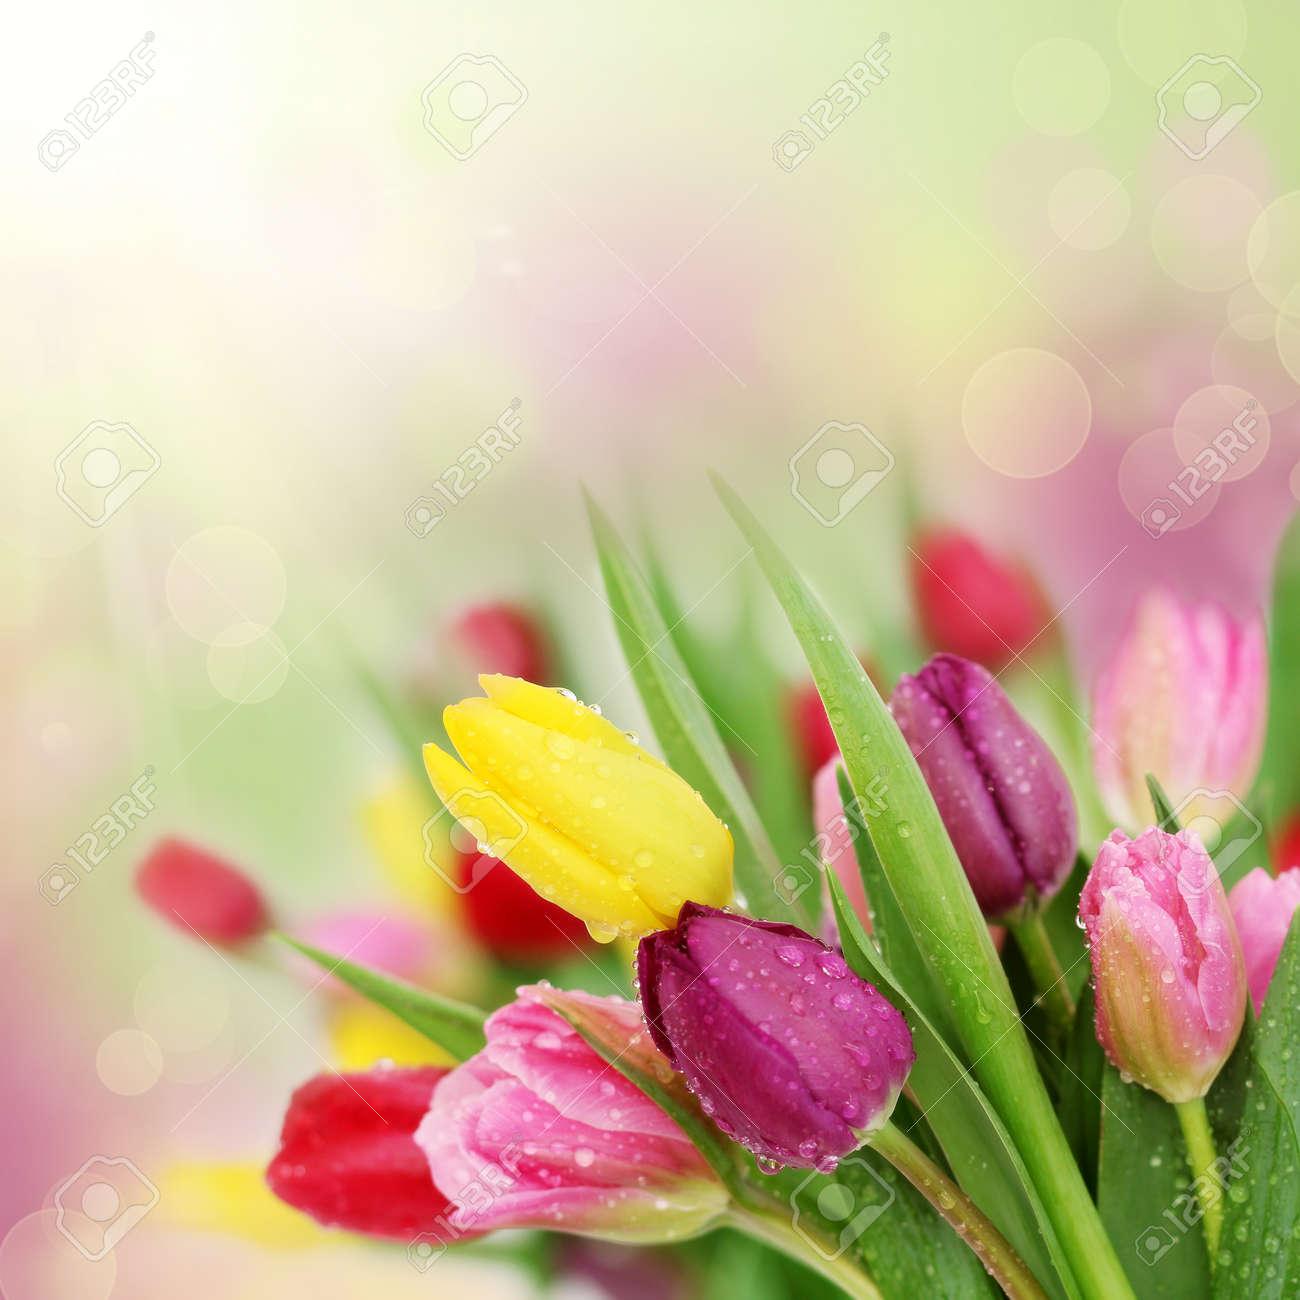 Картинки о весне капель